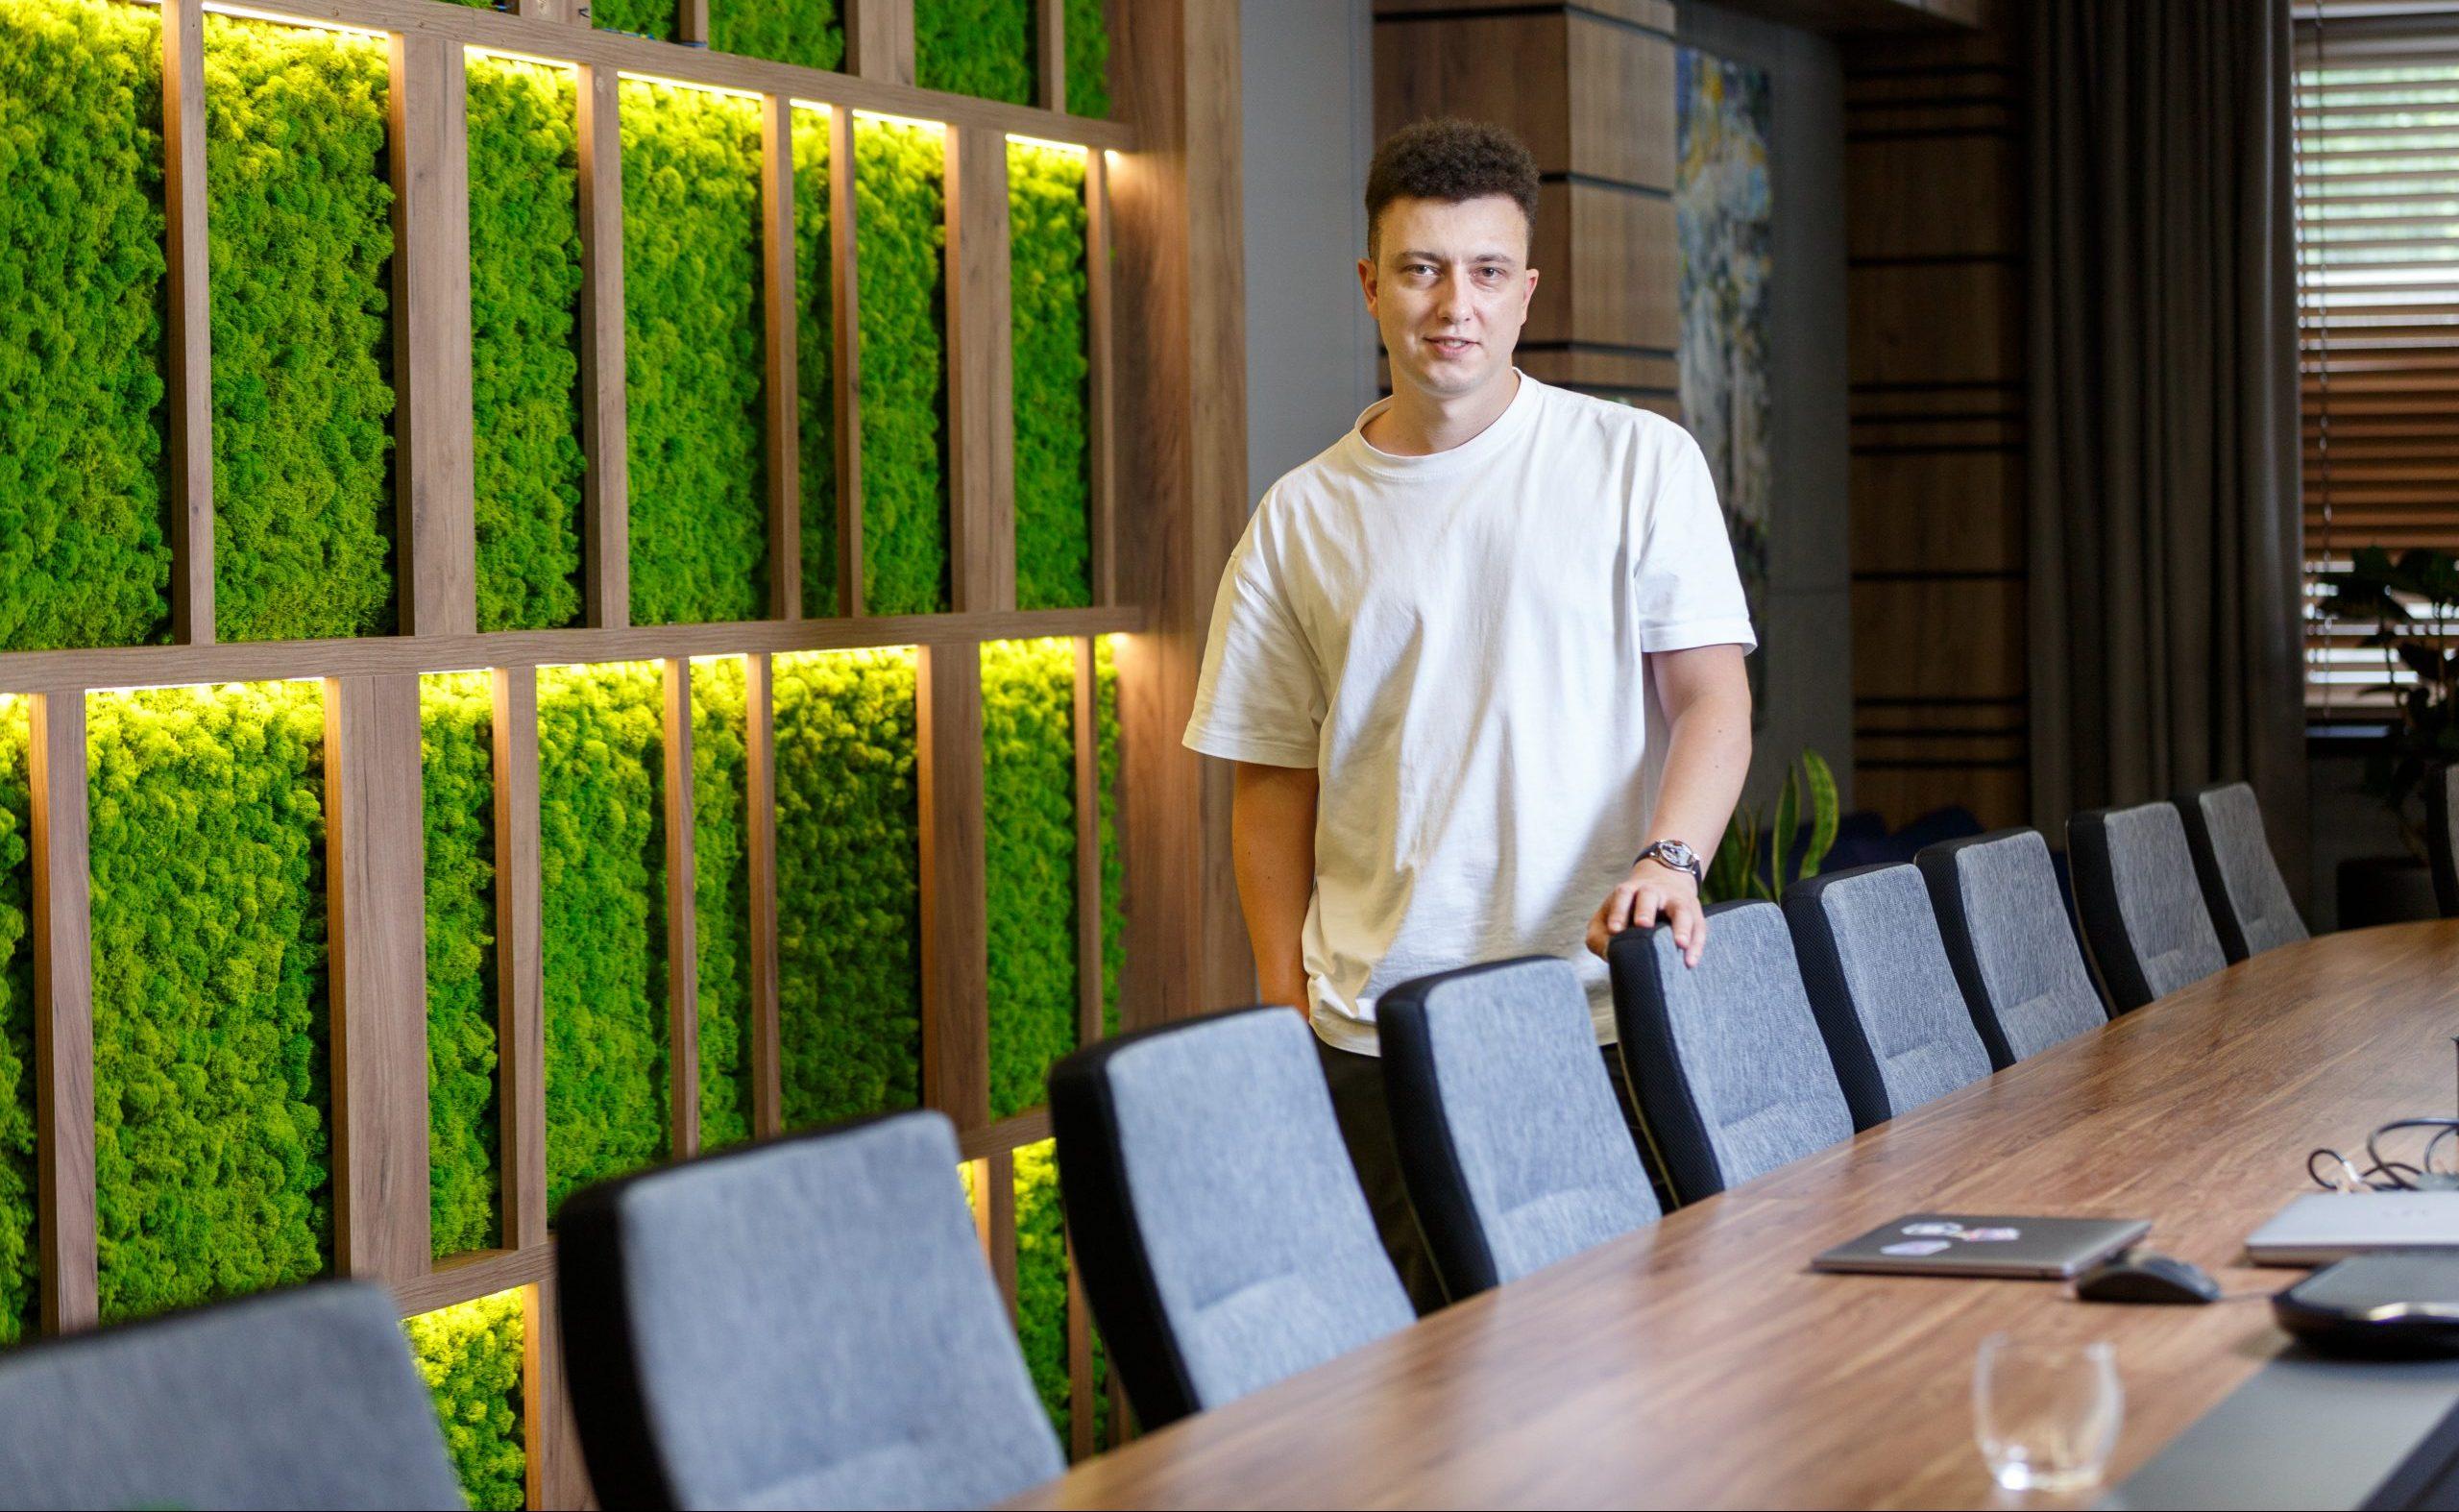 Алексей Малышко, бренд-директор компании Favbet